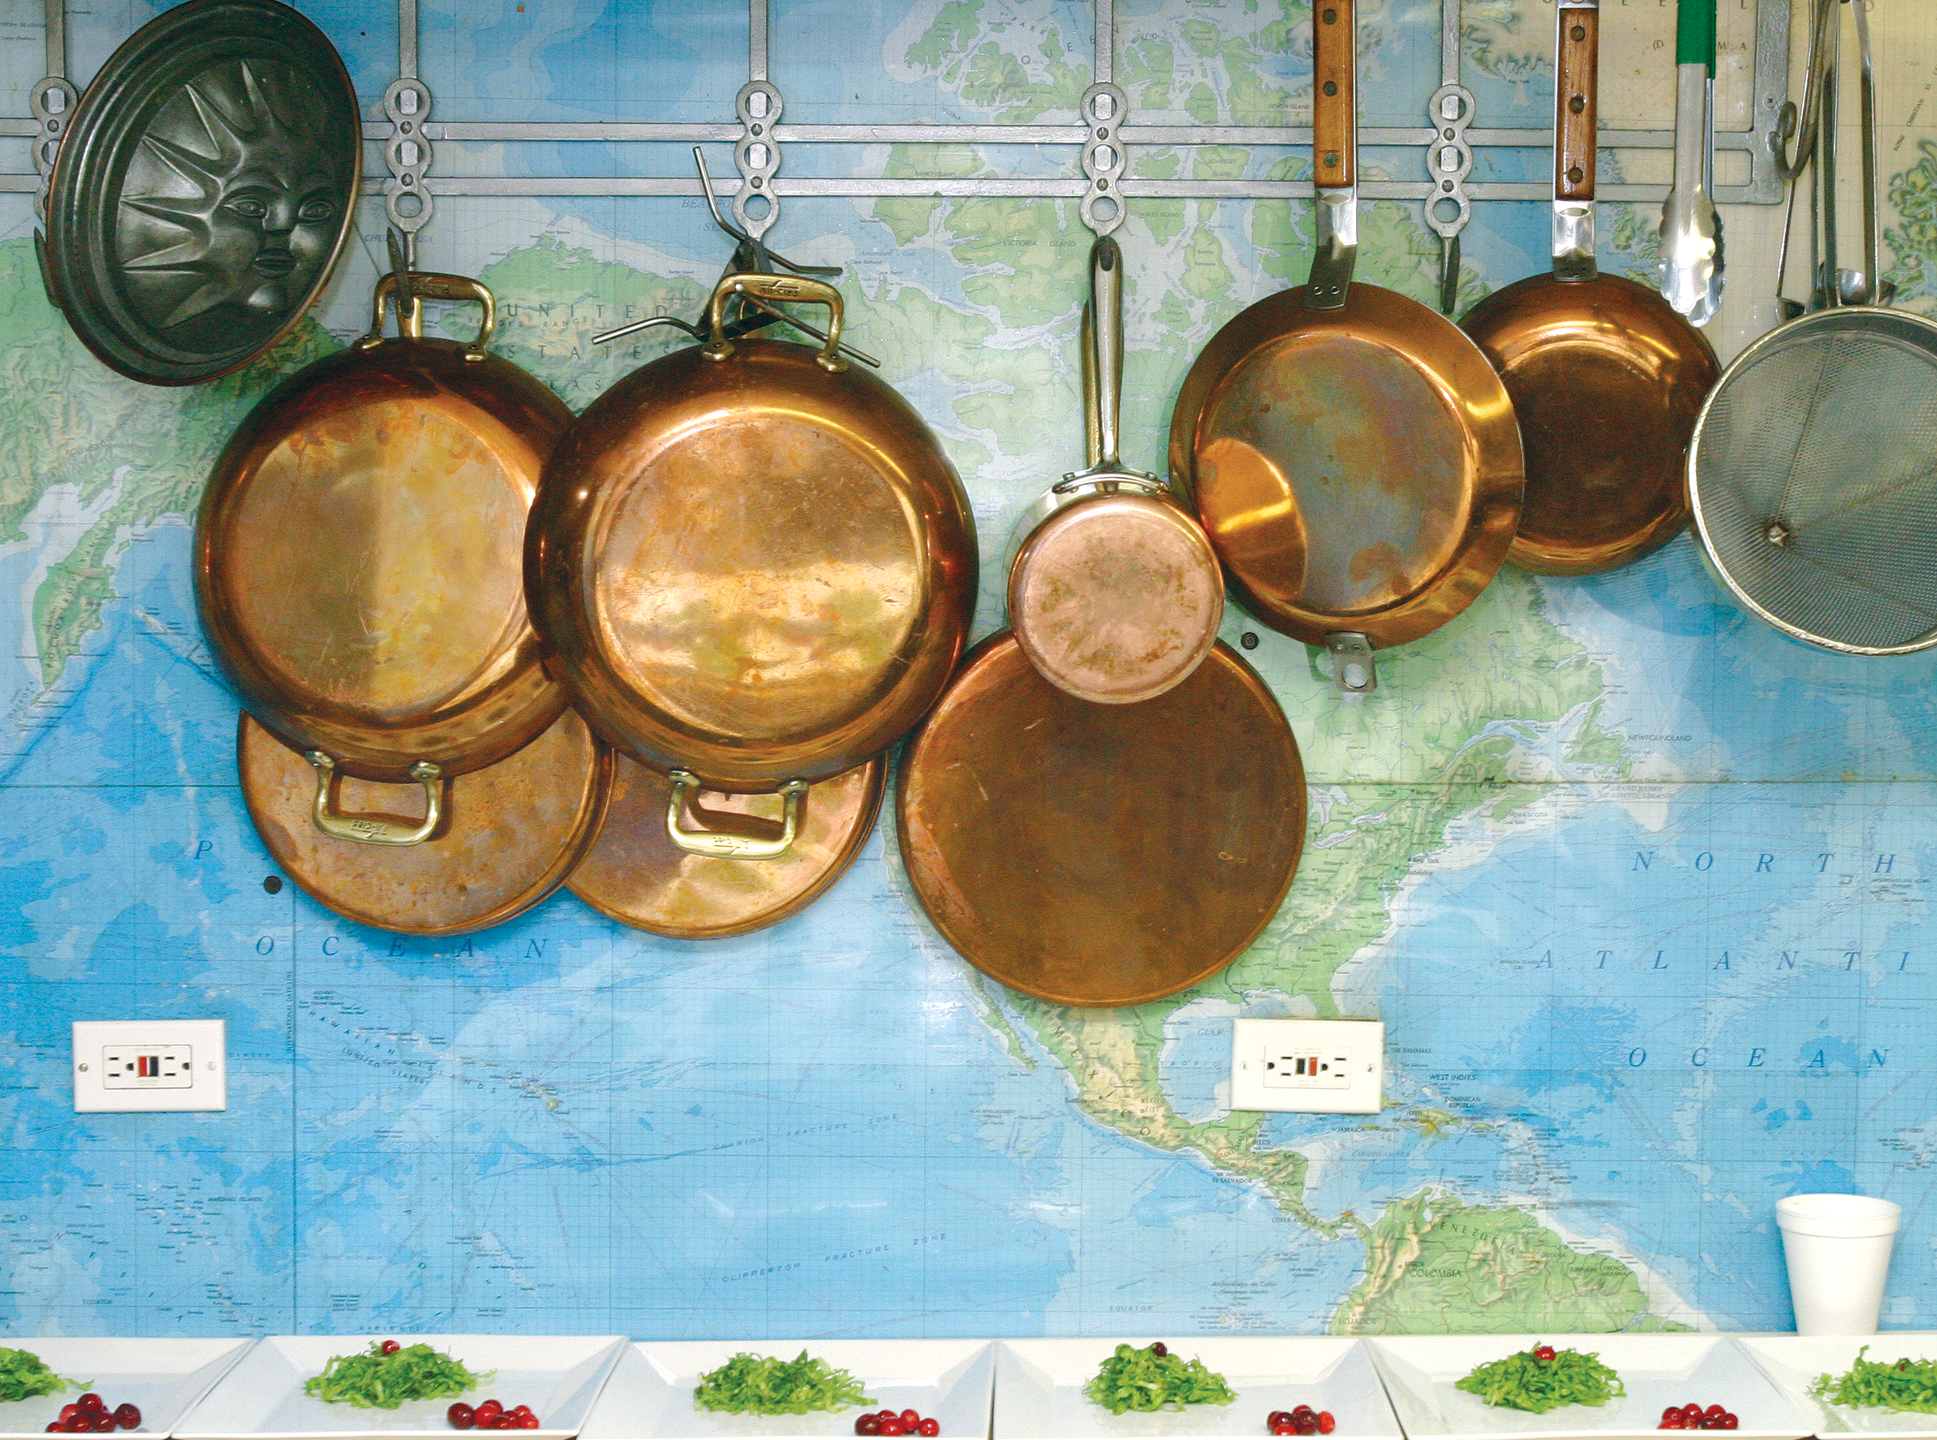 James Beard Kitchen from Krishna Dayanidhi photo